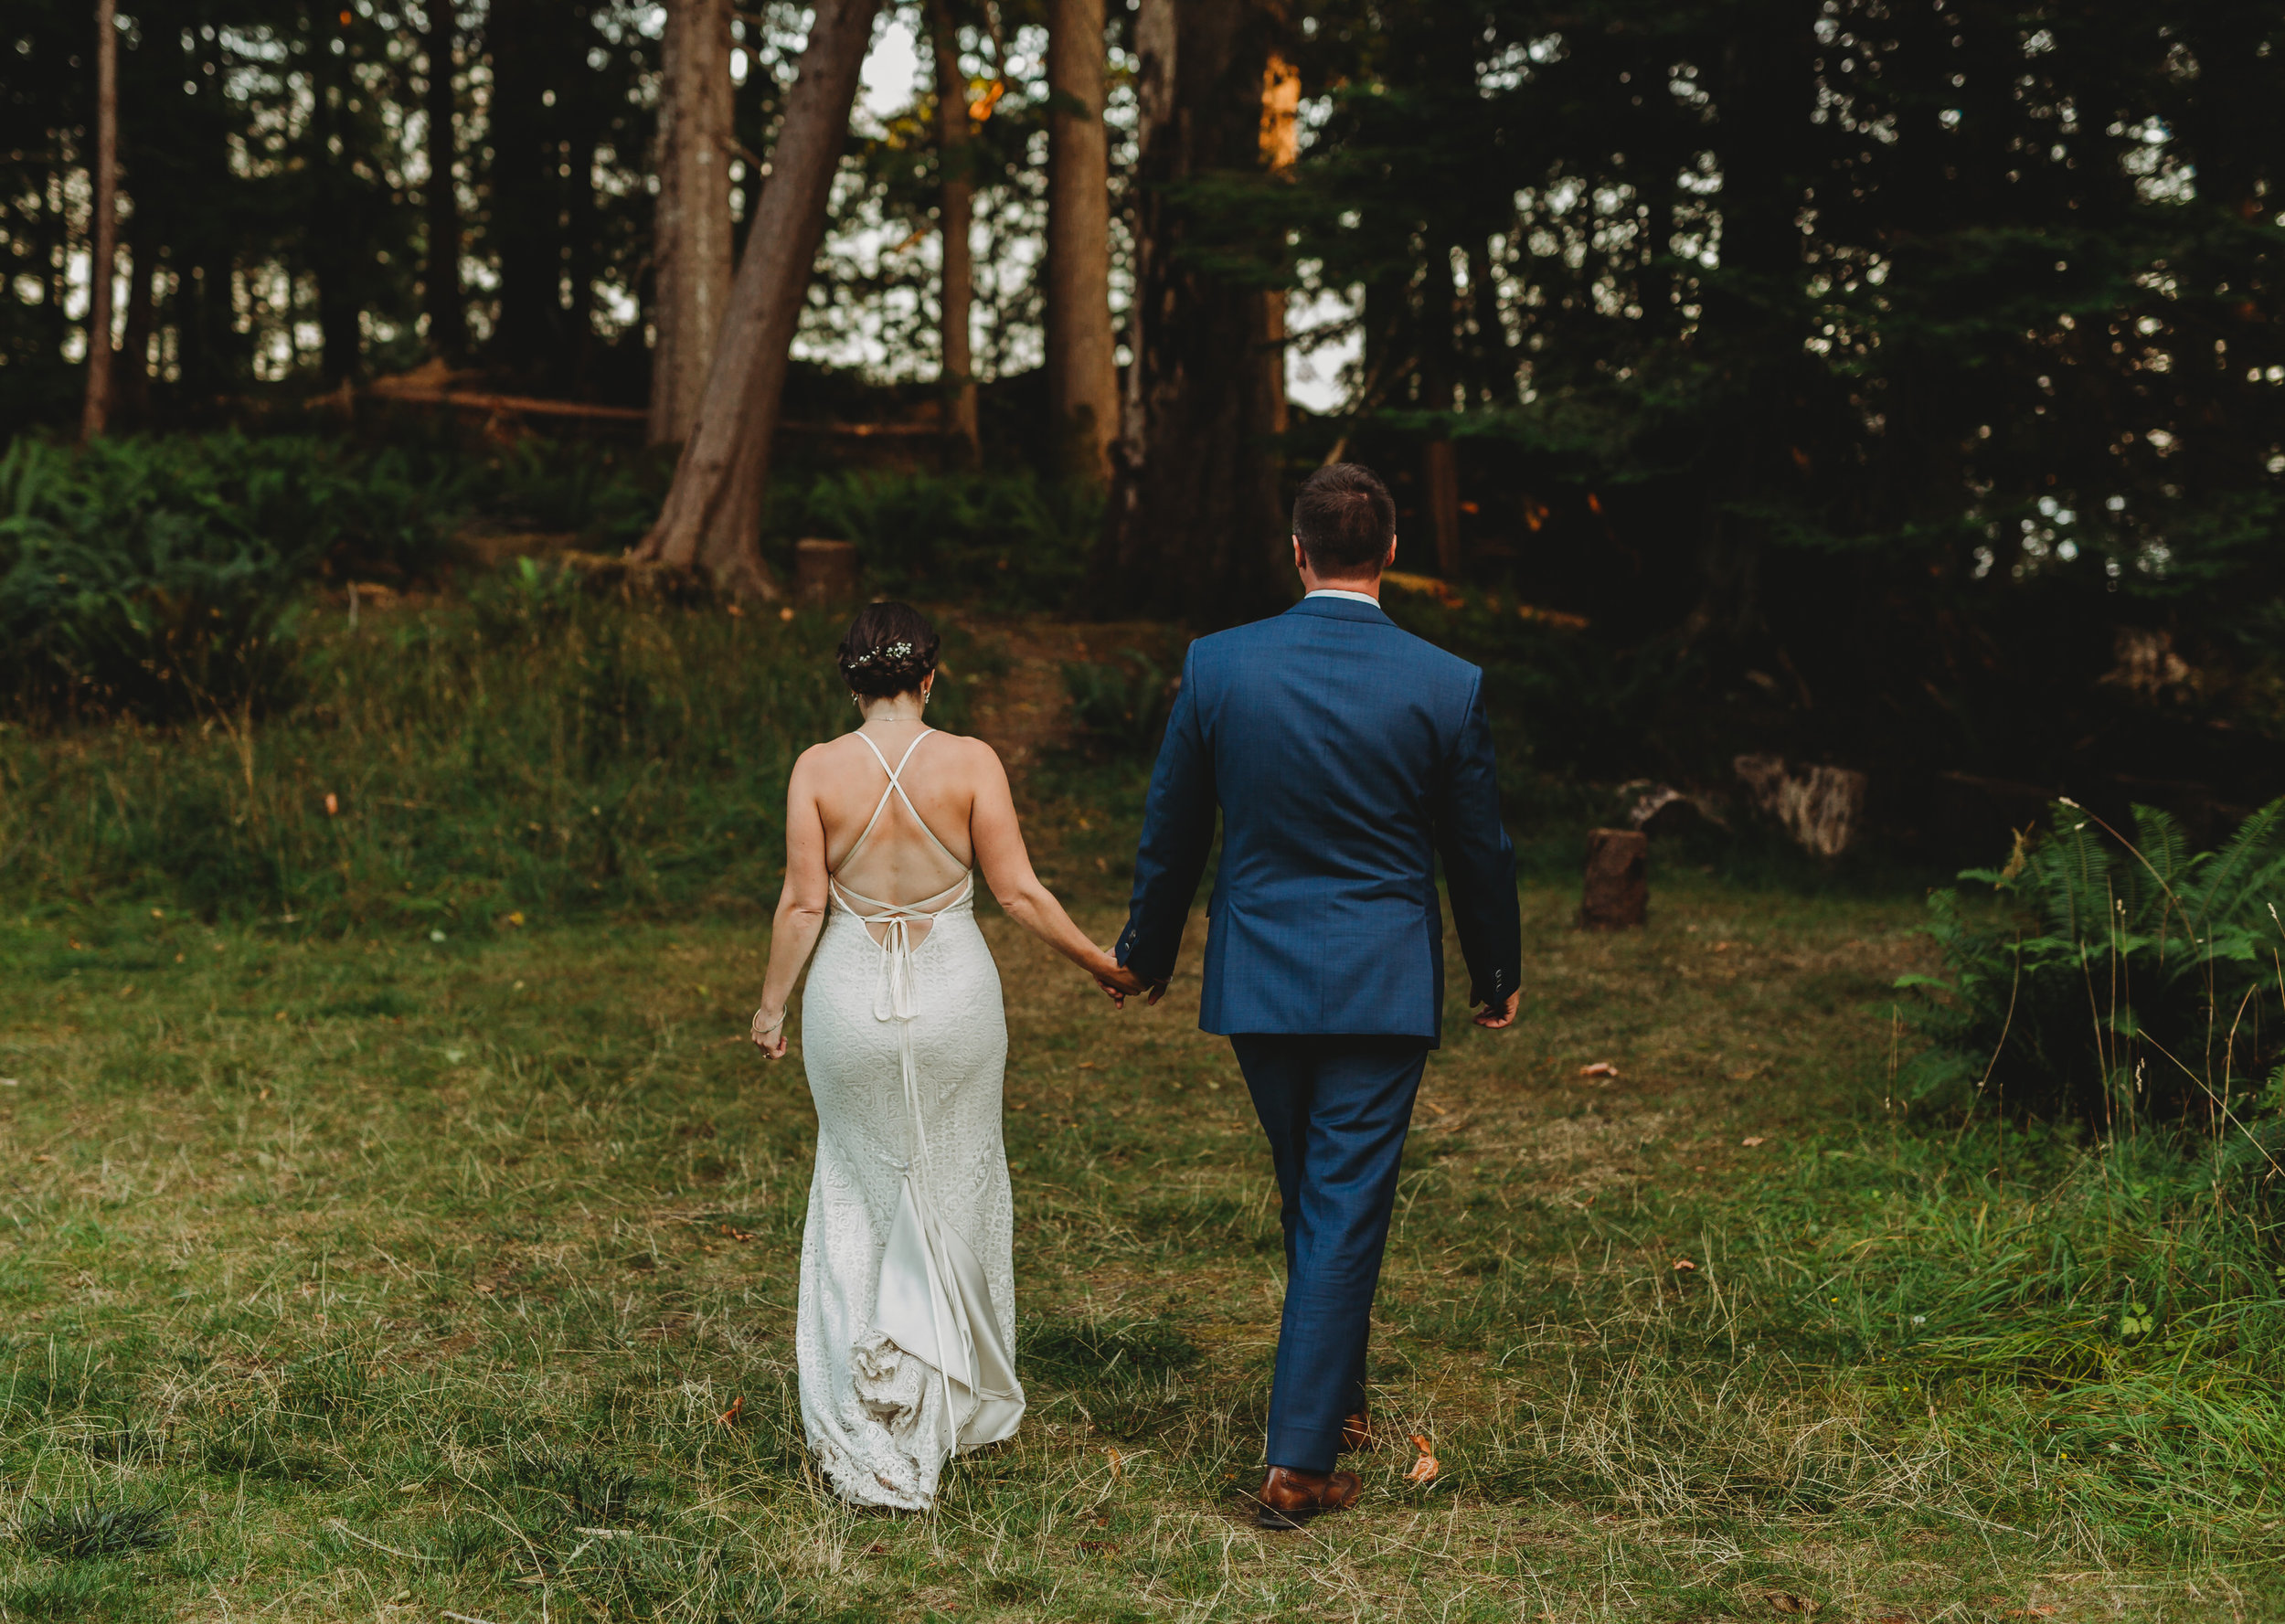 Camp Fircom Wedding - Vancouver Wedding Photographer & Videographer - Sunshine Coast Wedding Photos - Sunshine Coast Wedding Photographer - Jennifer Picard Photography - IMG_1093.jpg